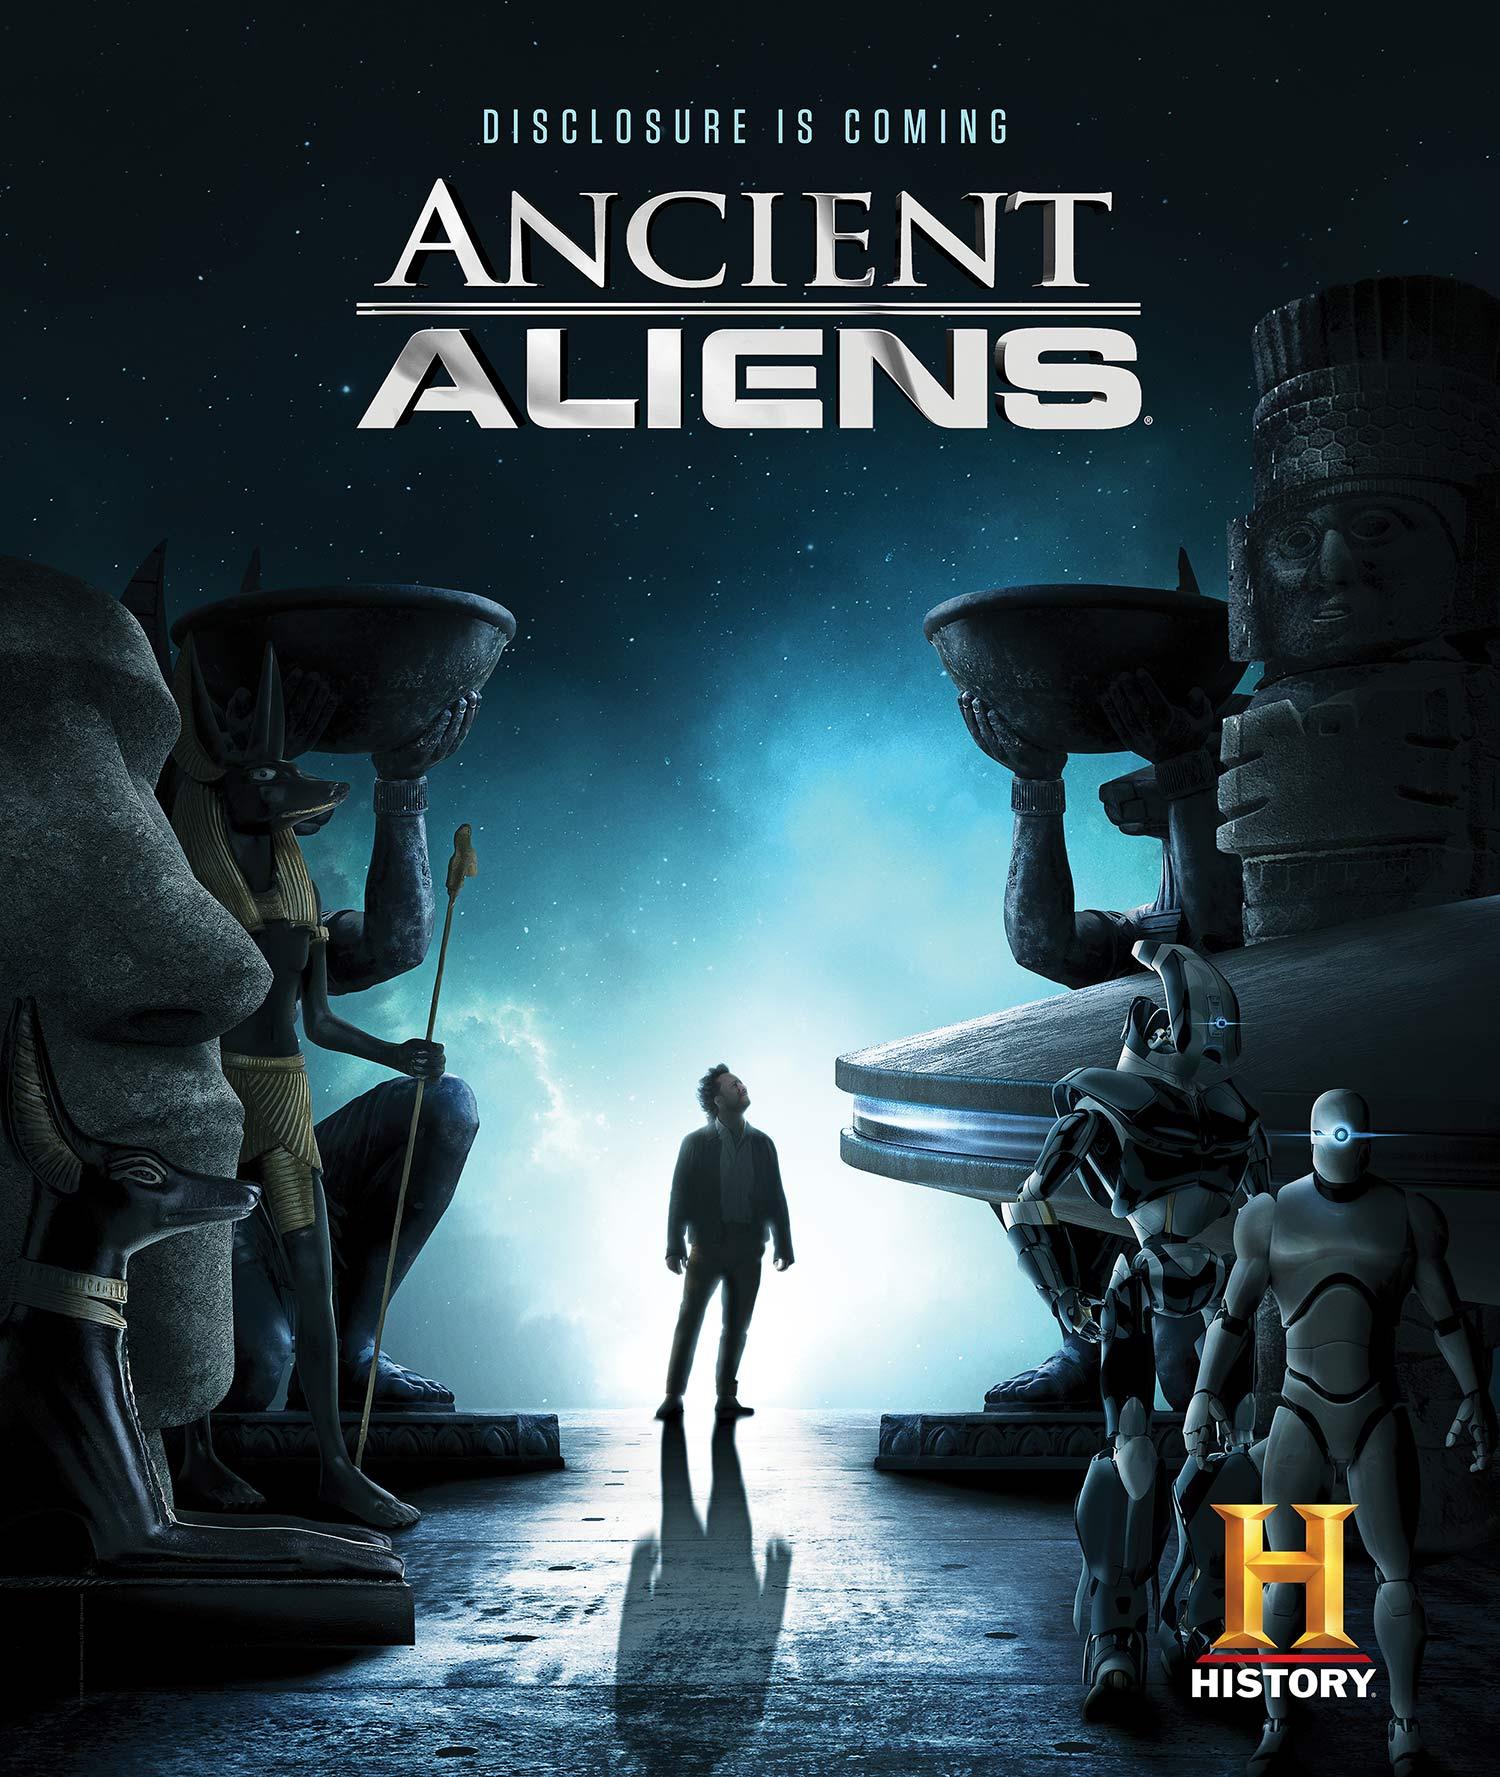 AncientAliens_1500px_320k